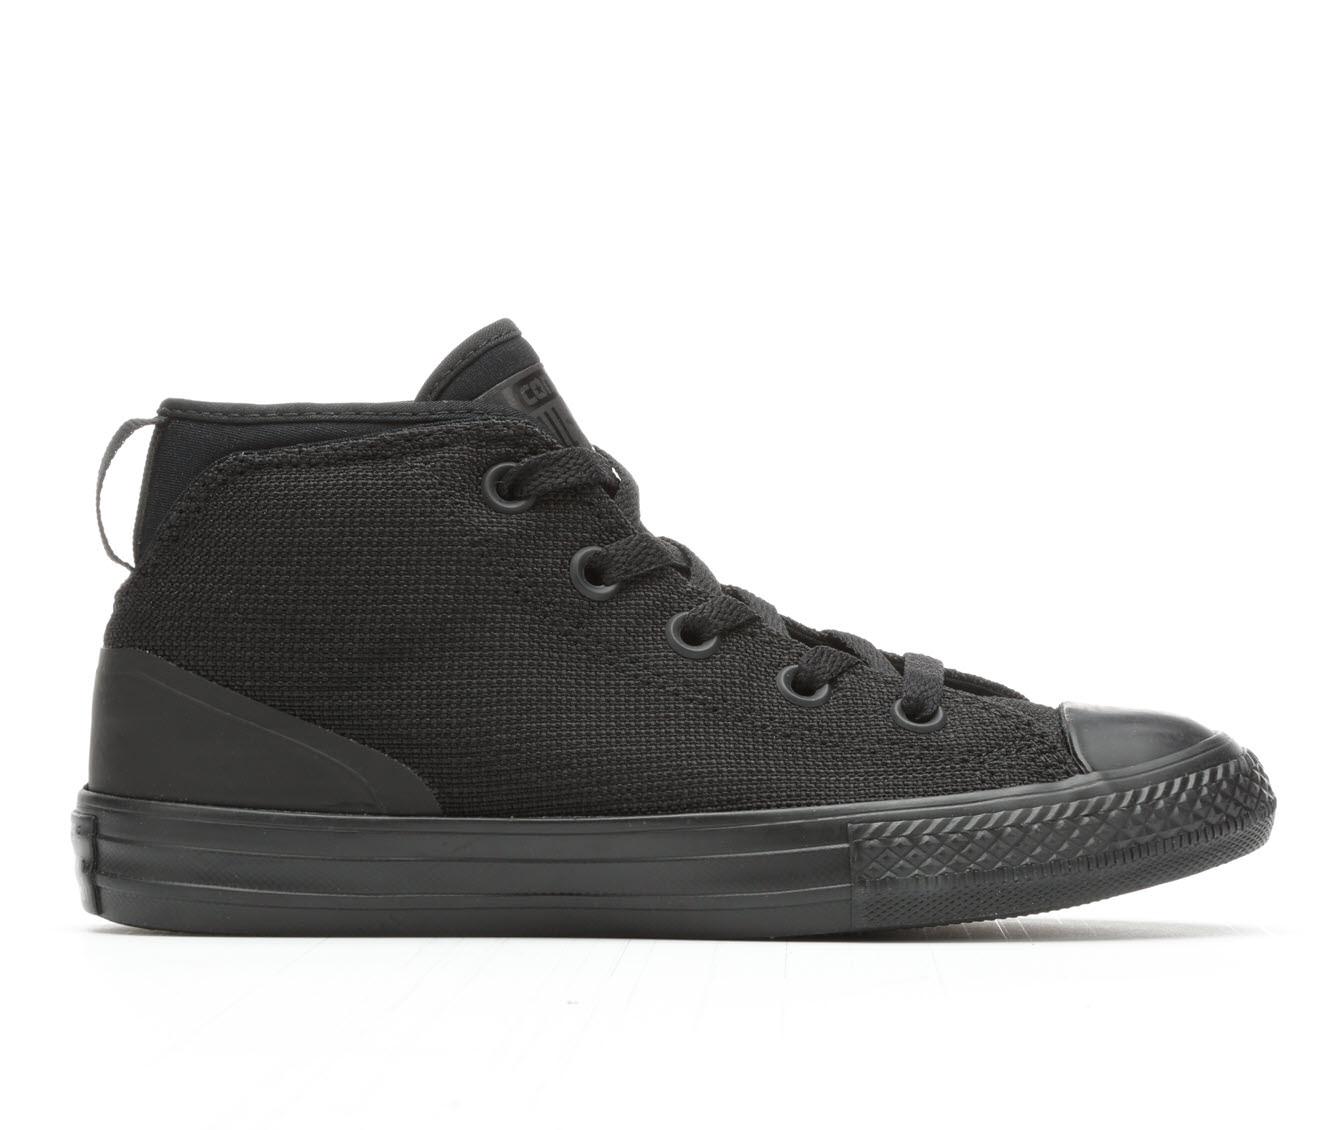 Boys' Converse Syde Street Tough Poly Sneakers (Black)